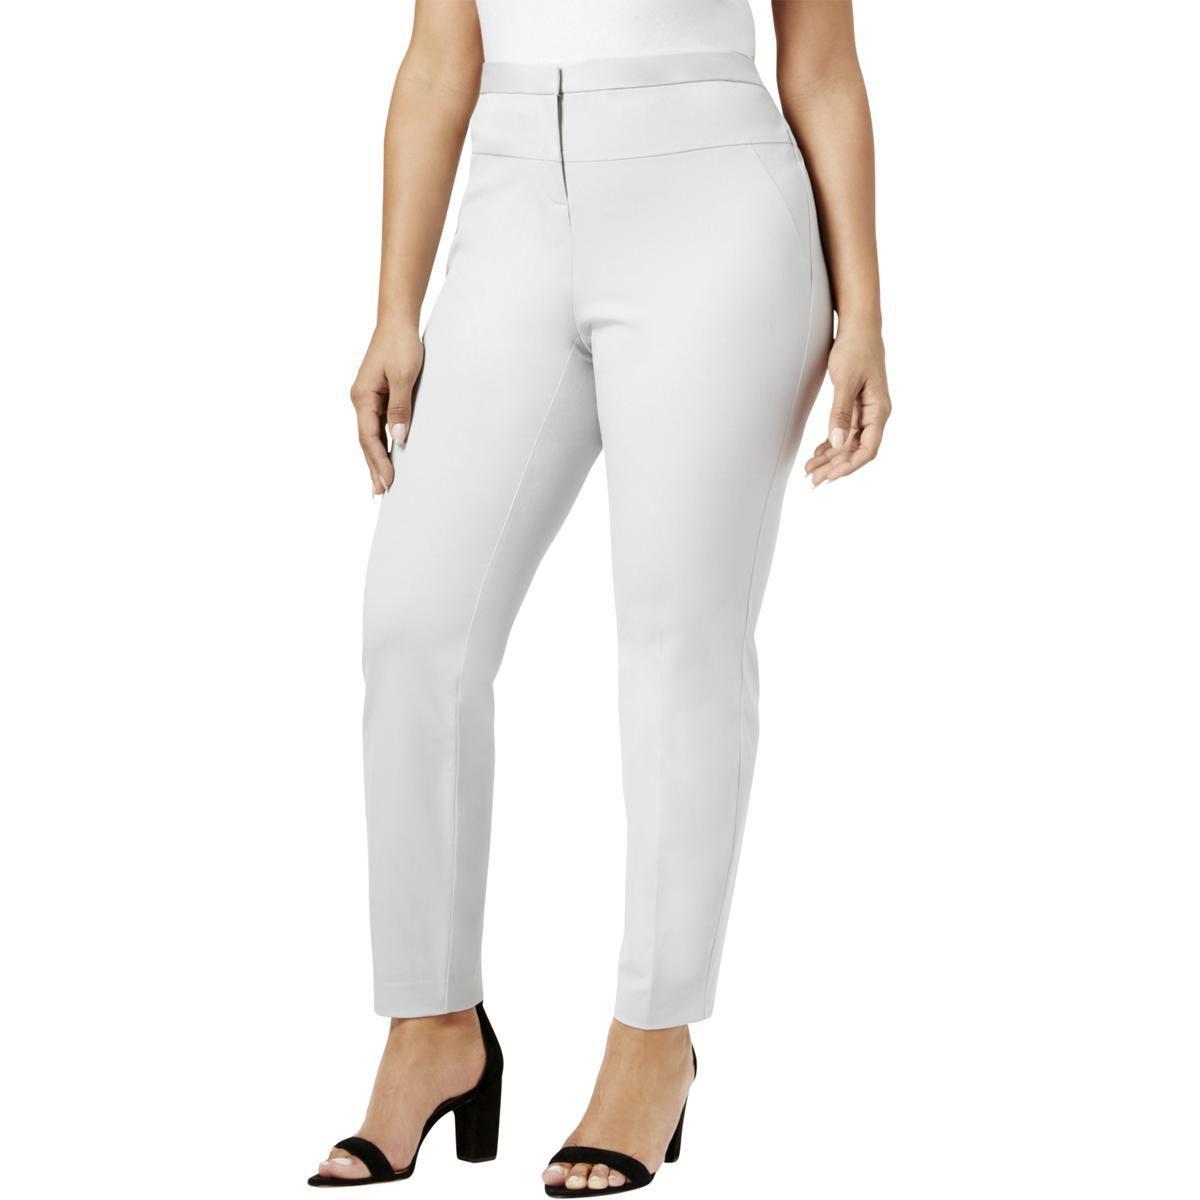 f182830569650 Lyst - Alfani Womens Plus Comfort Waist Seamed Skinny Pants in Gray